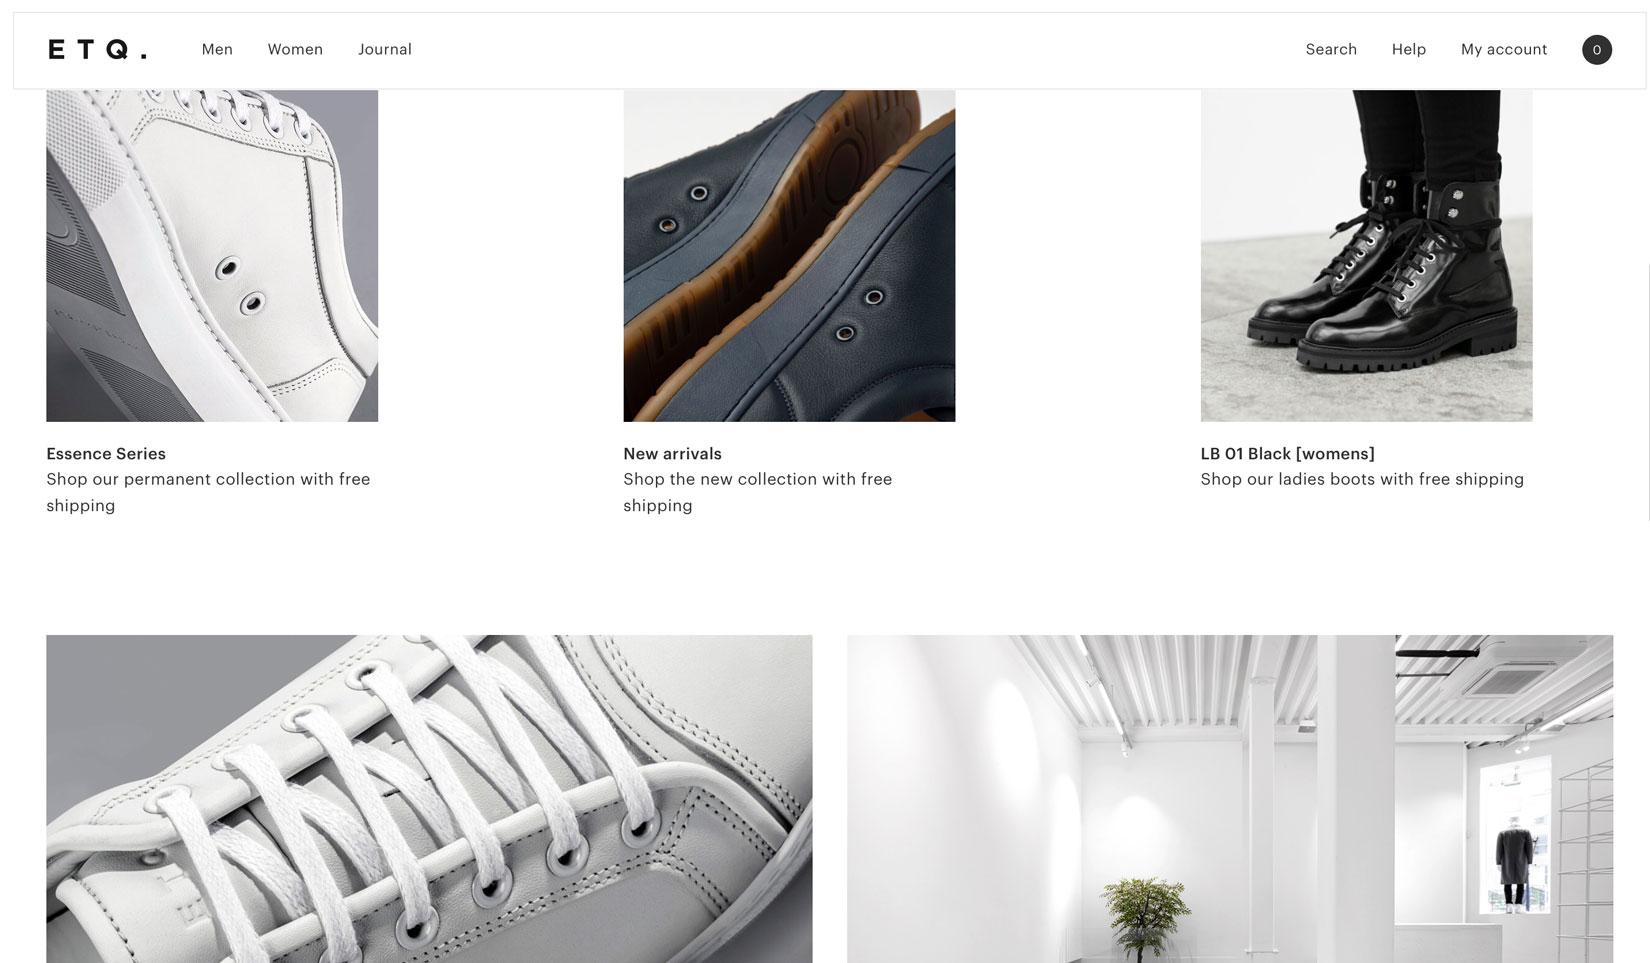 snygg-hemsida-2019-minimalistisk